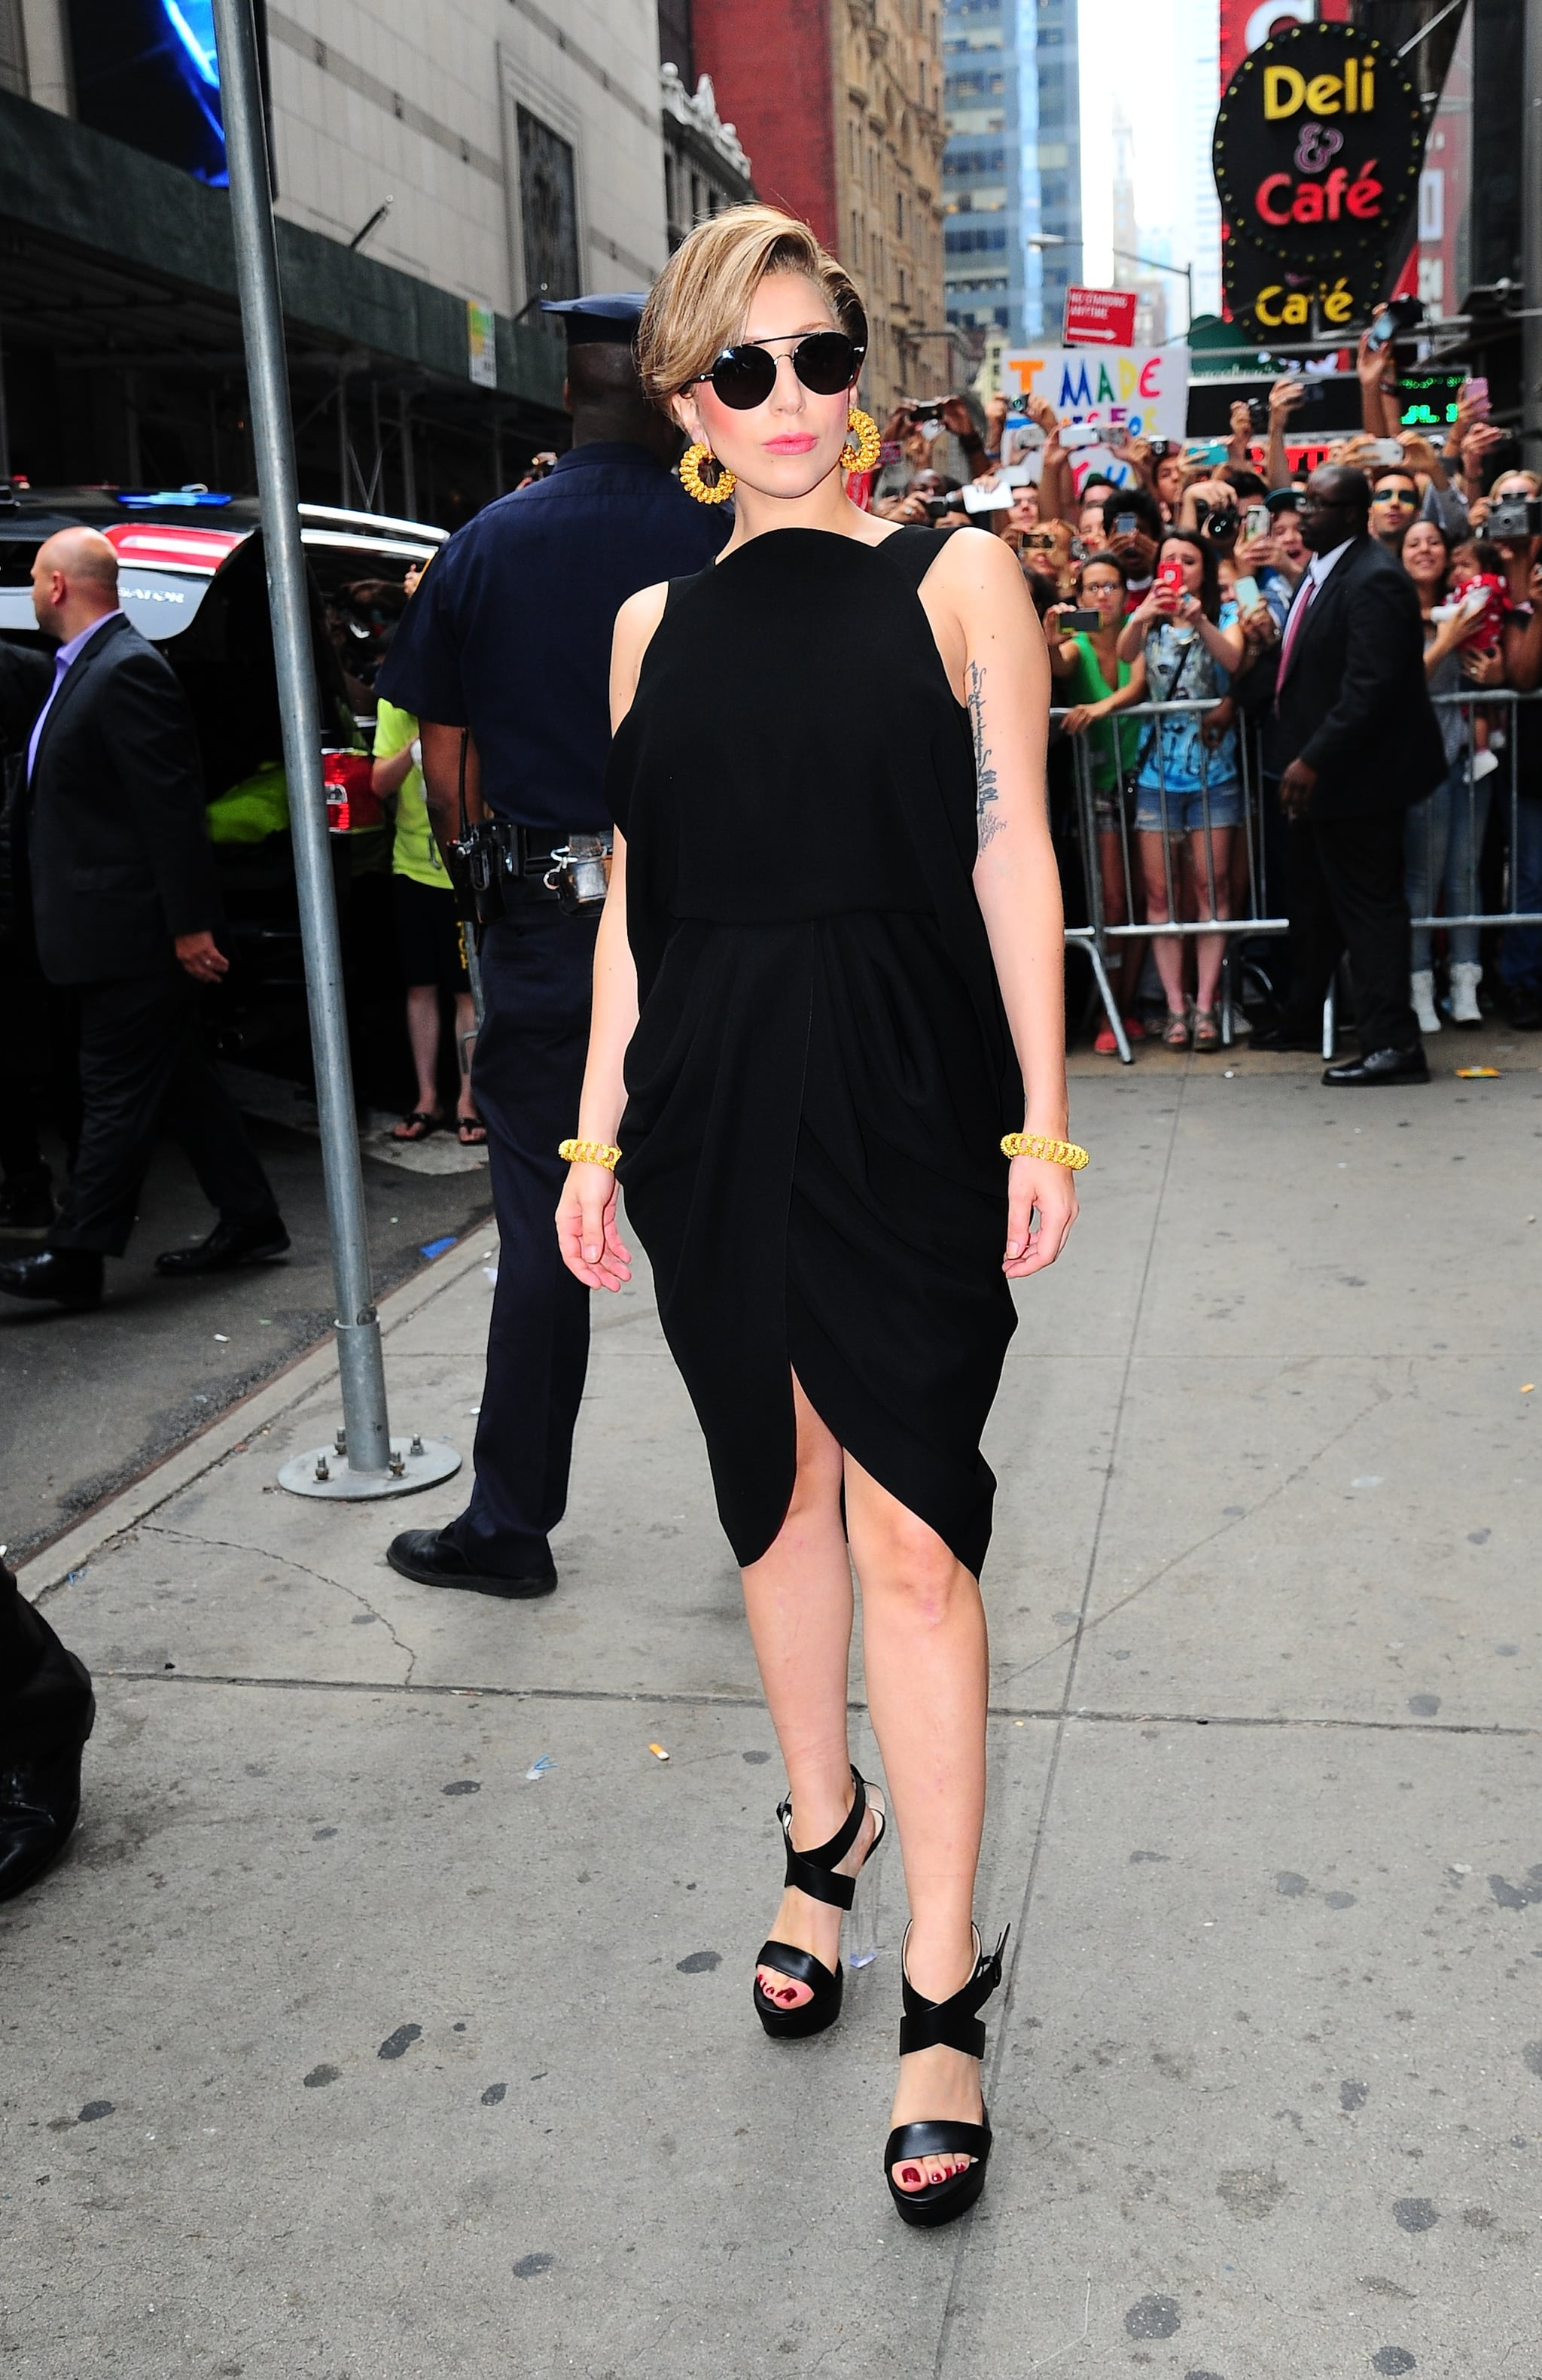 Lady Gaga in New York City